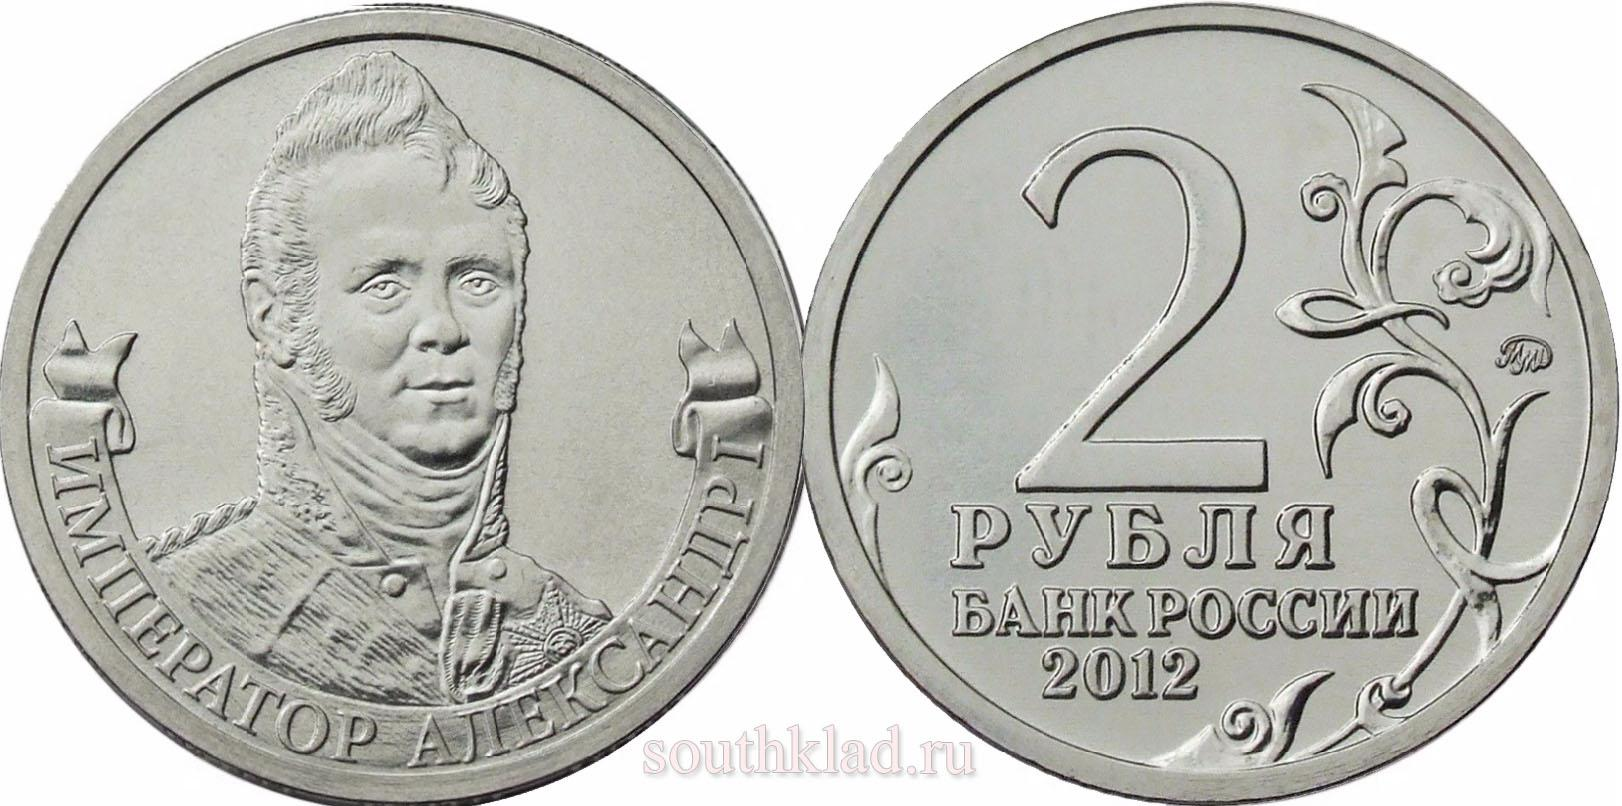 "2 рубля 2012 года ""Император Александр I"""